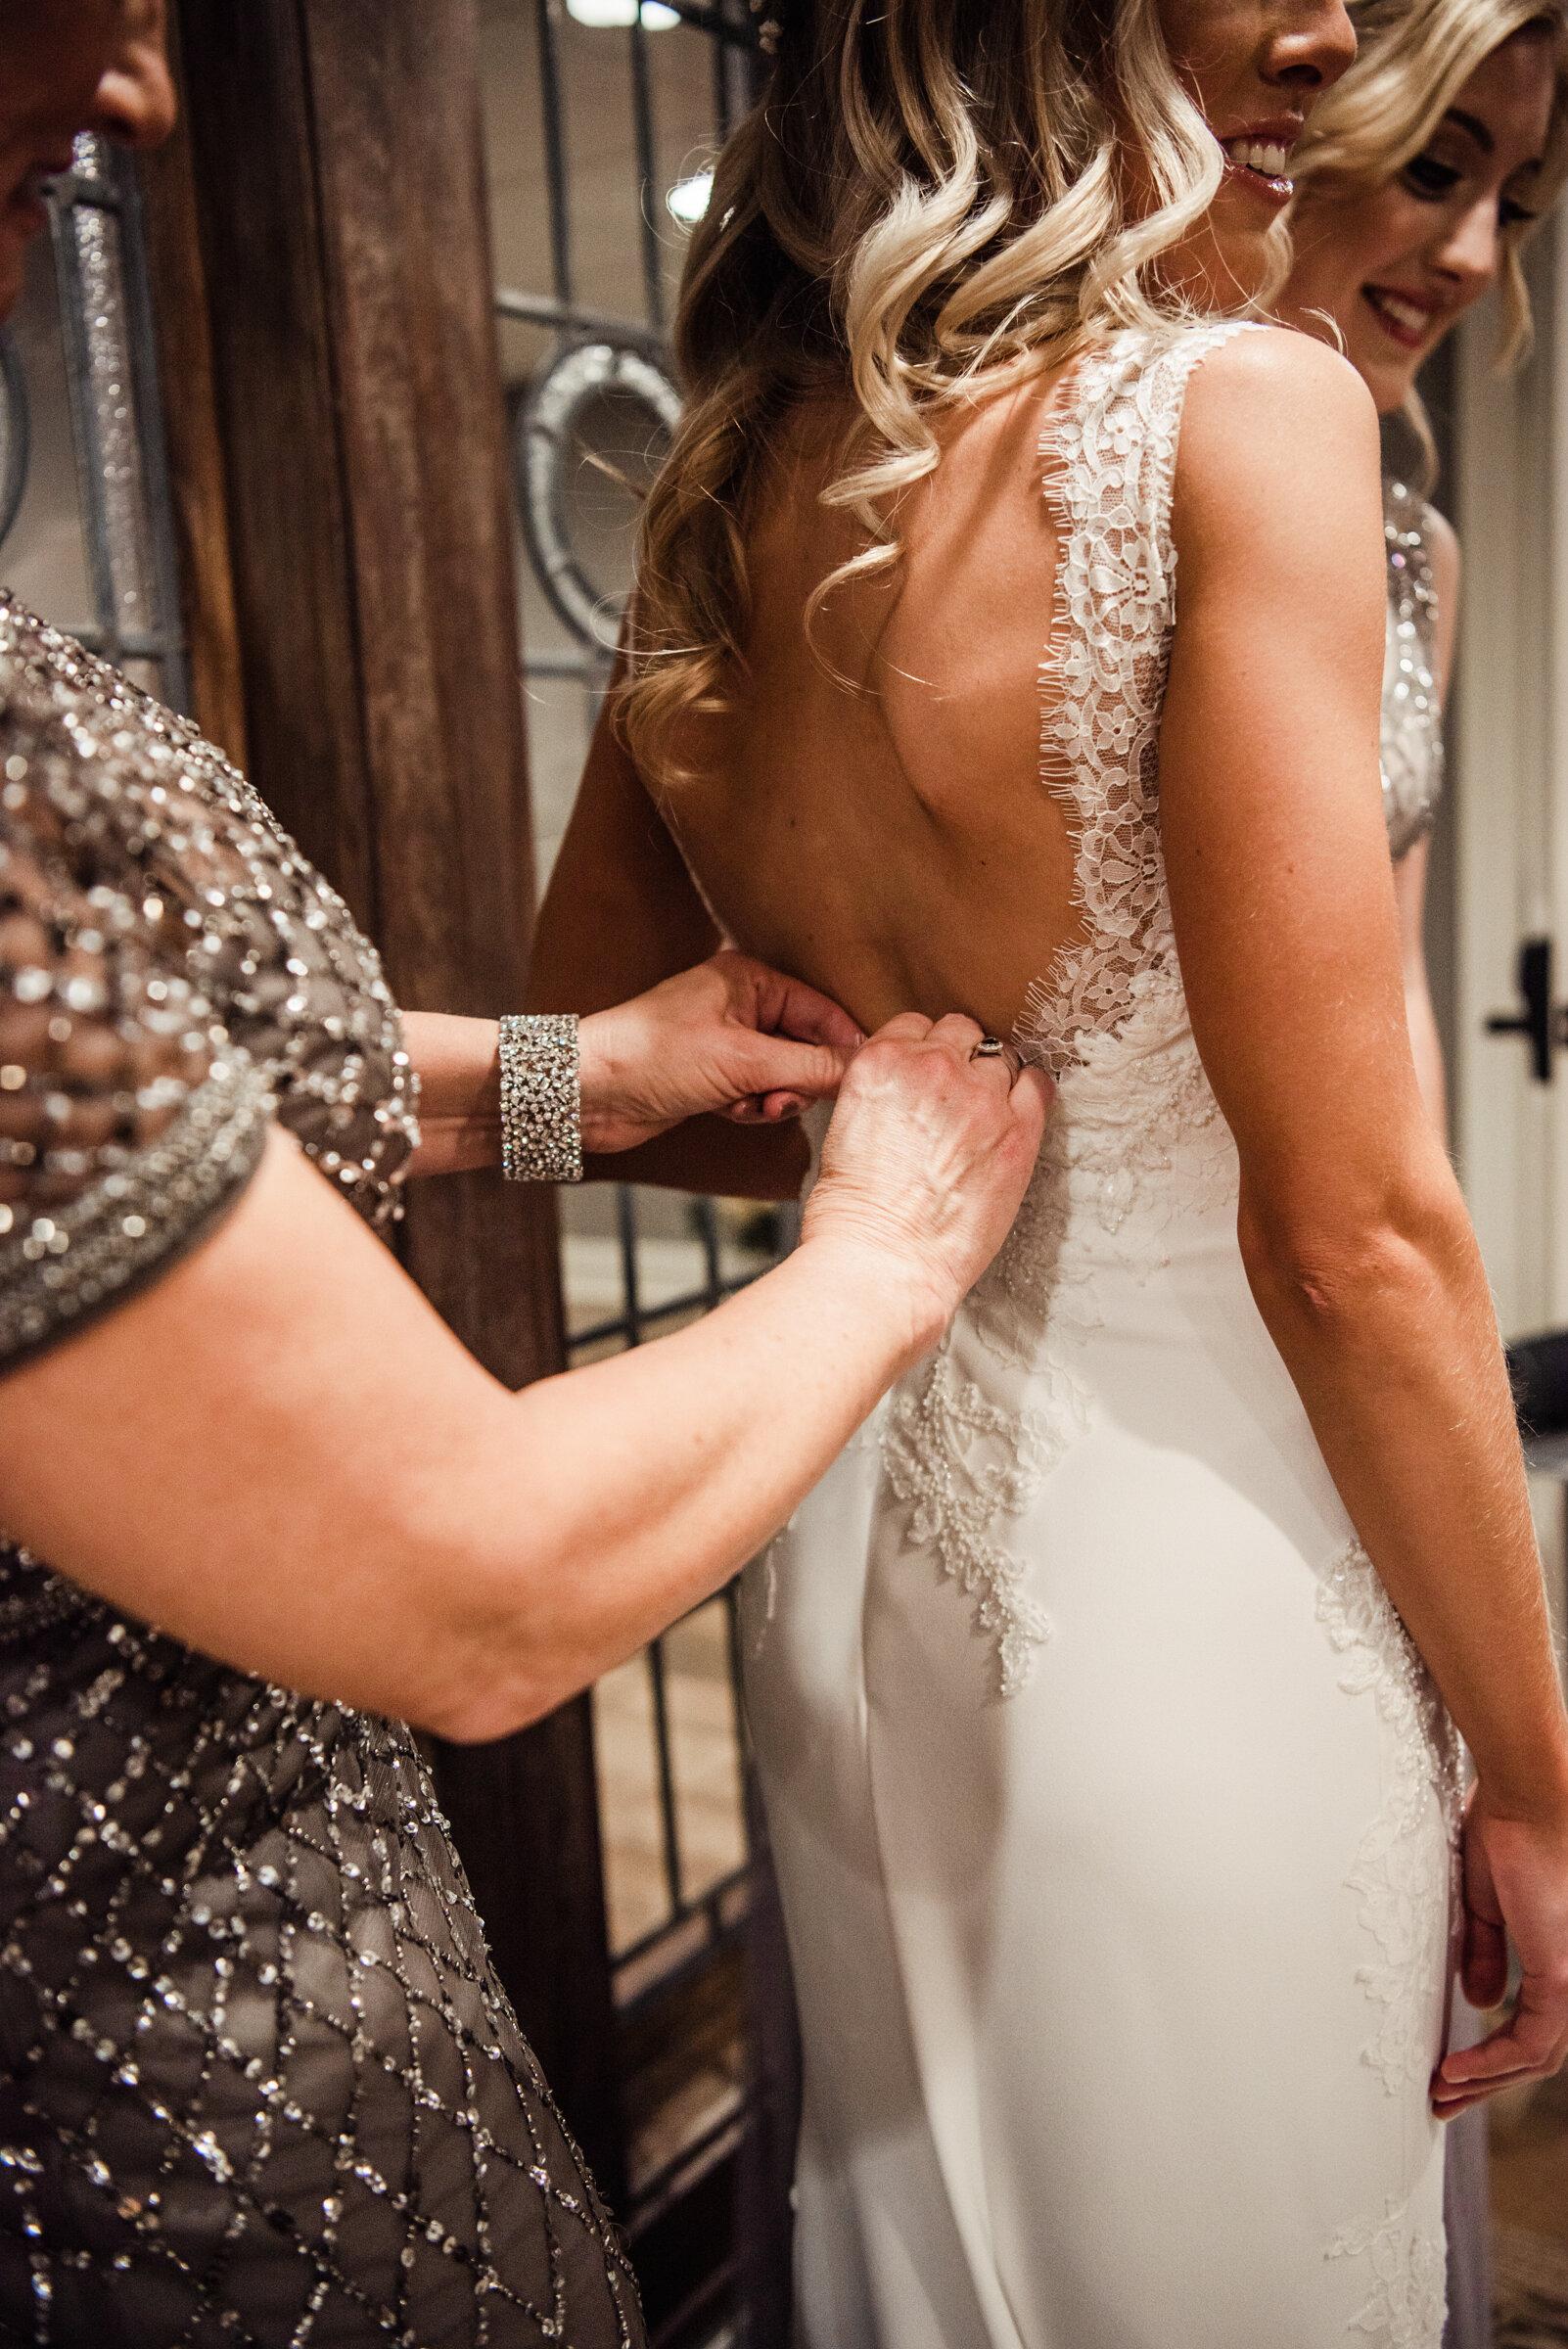 Deerfield_Country_Club_Rochester_Wedding_JILL_STUDIO_Rochester_NY_Photographer_DSC_5988.jpg